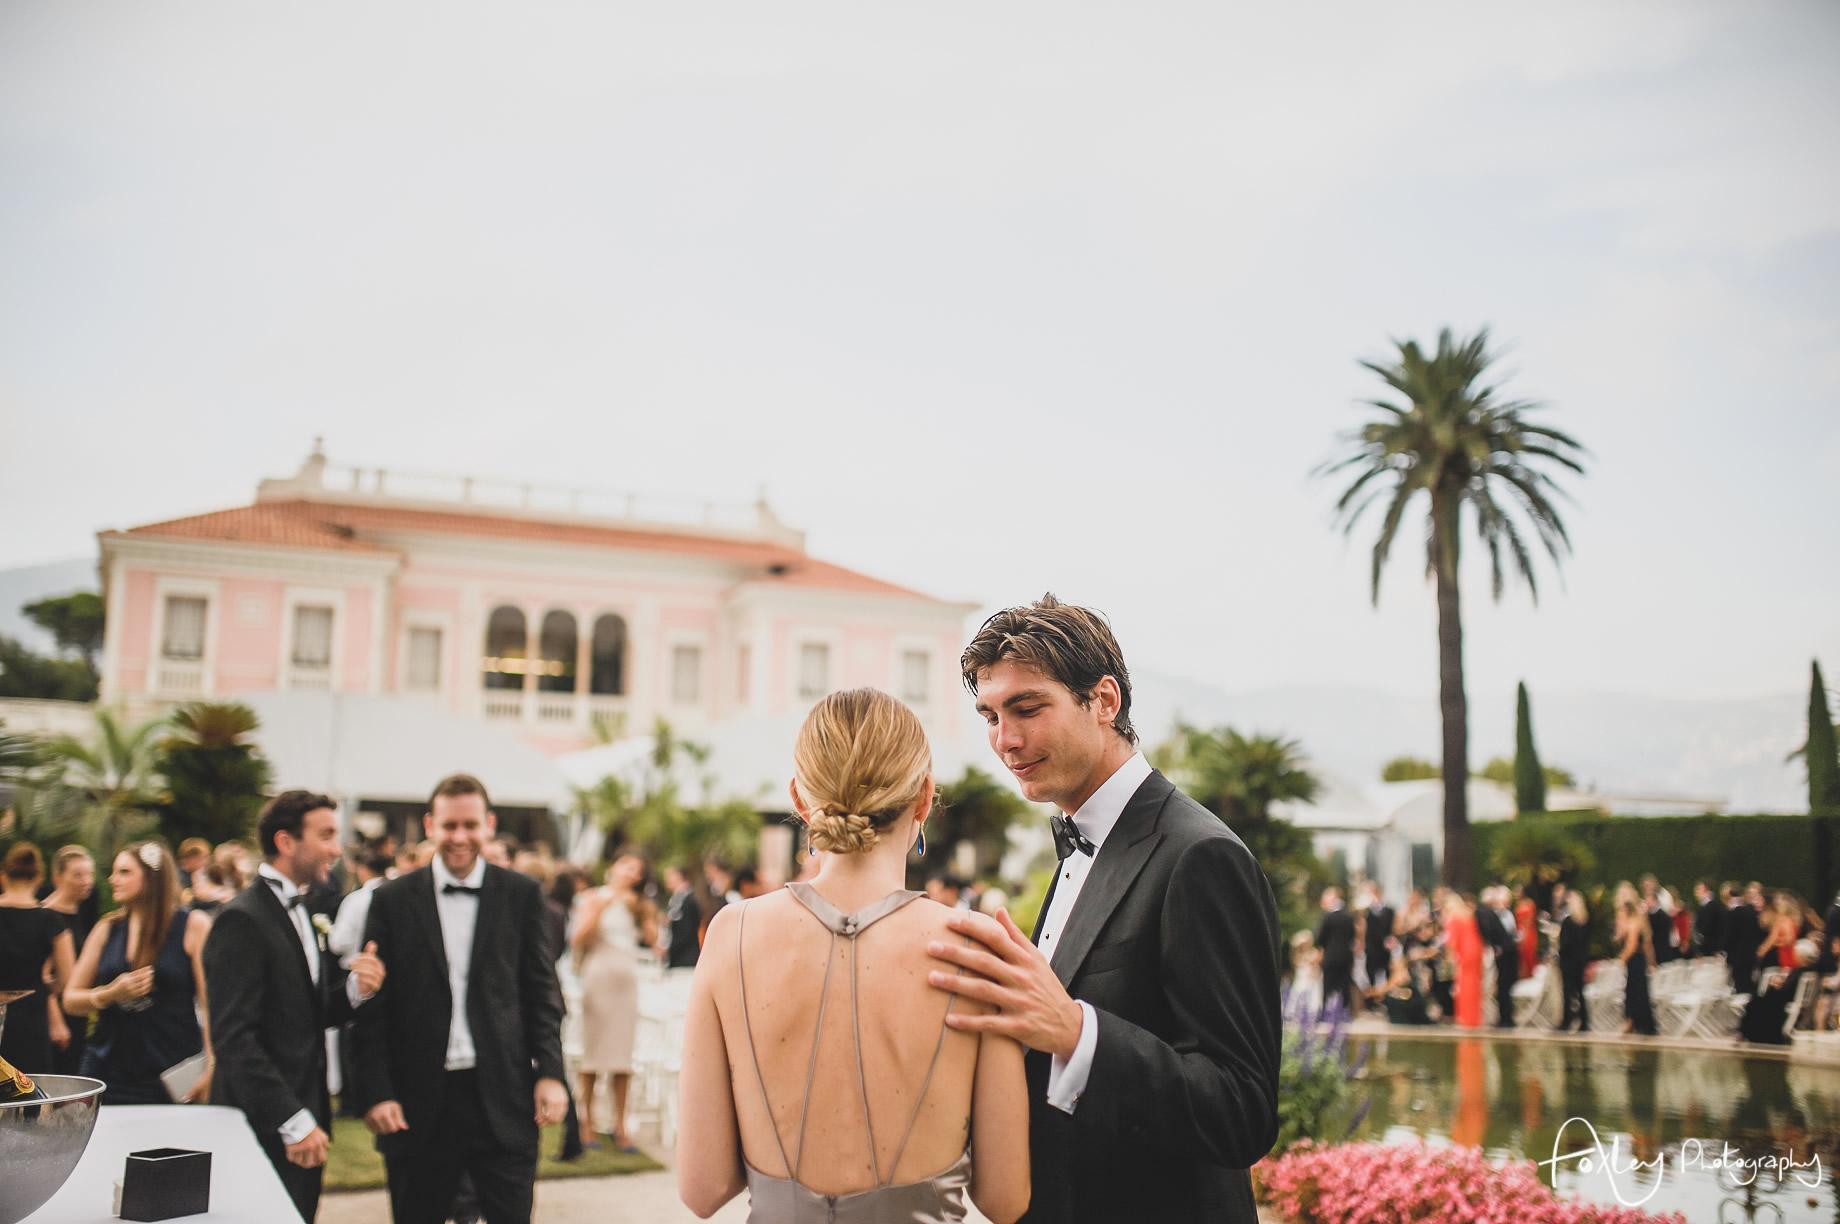 Jil and Will's Wedding at Villa Ephrussi De Rothschild 119